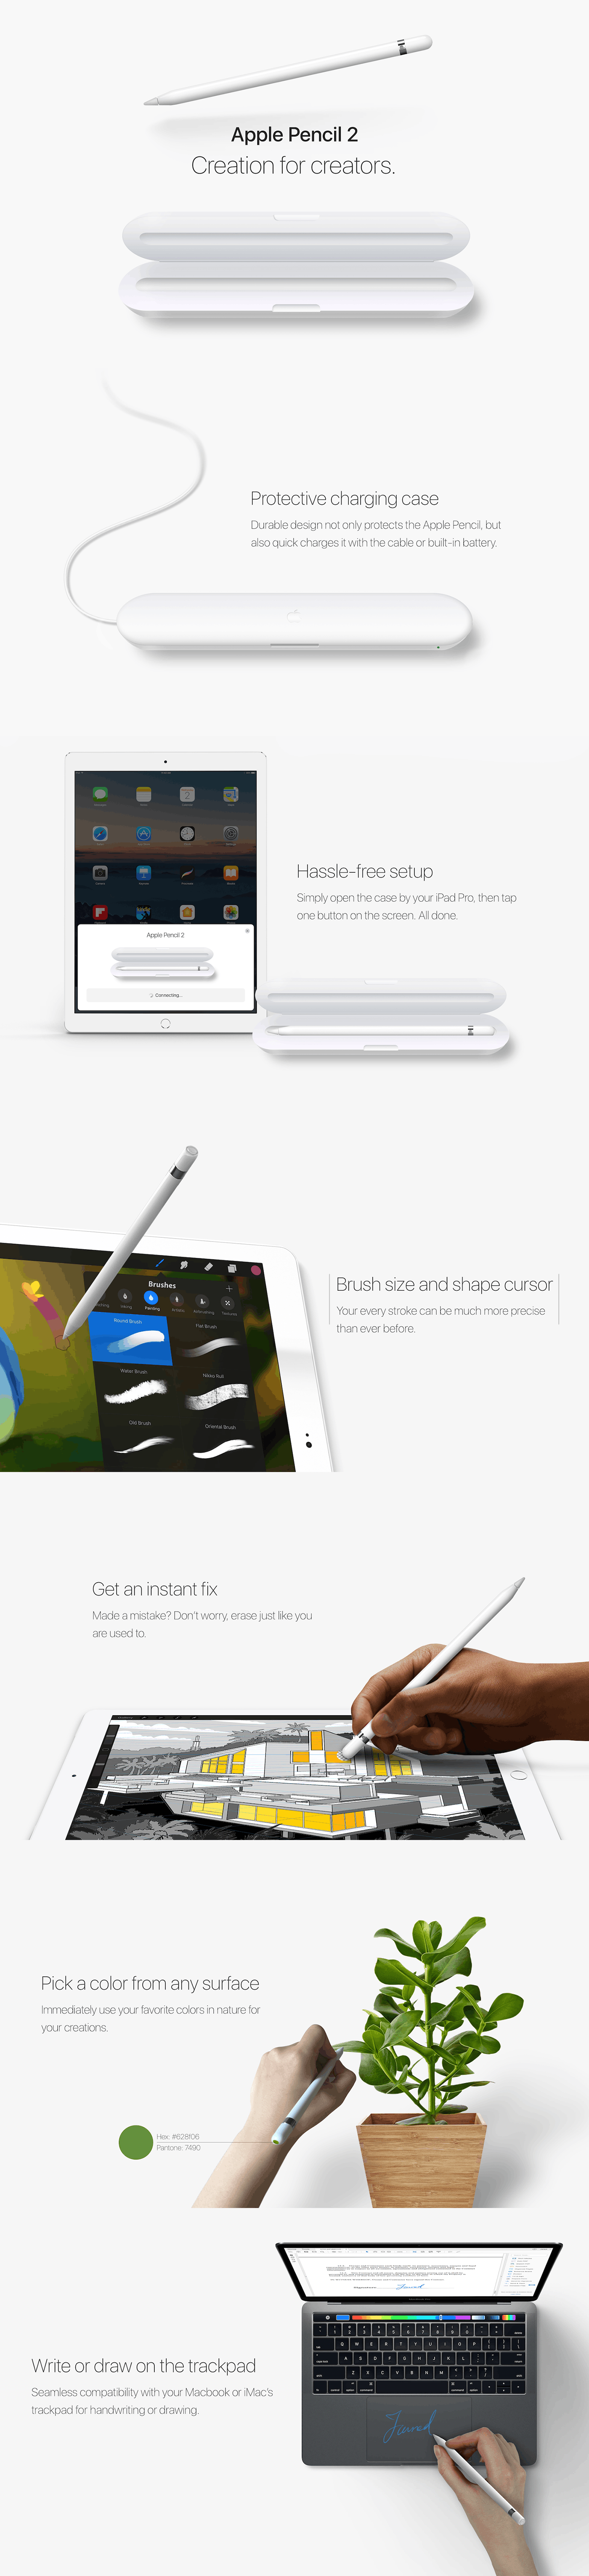 Apple Pencil久未更新 设计师设想2代新特性的照片